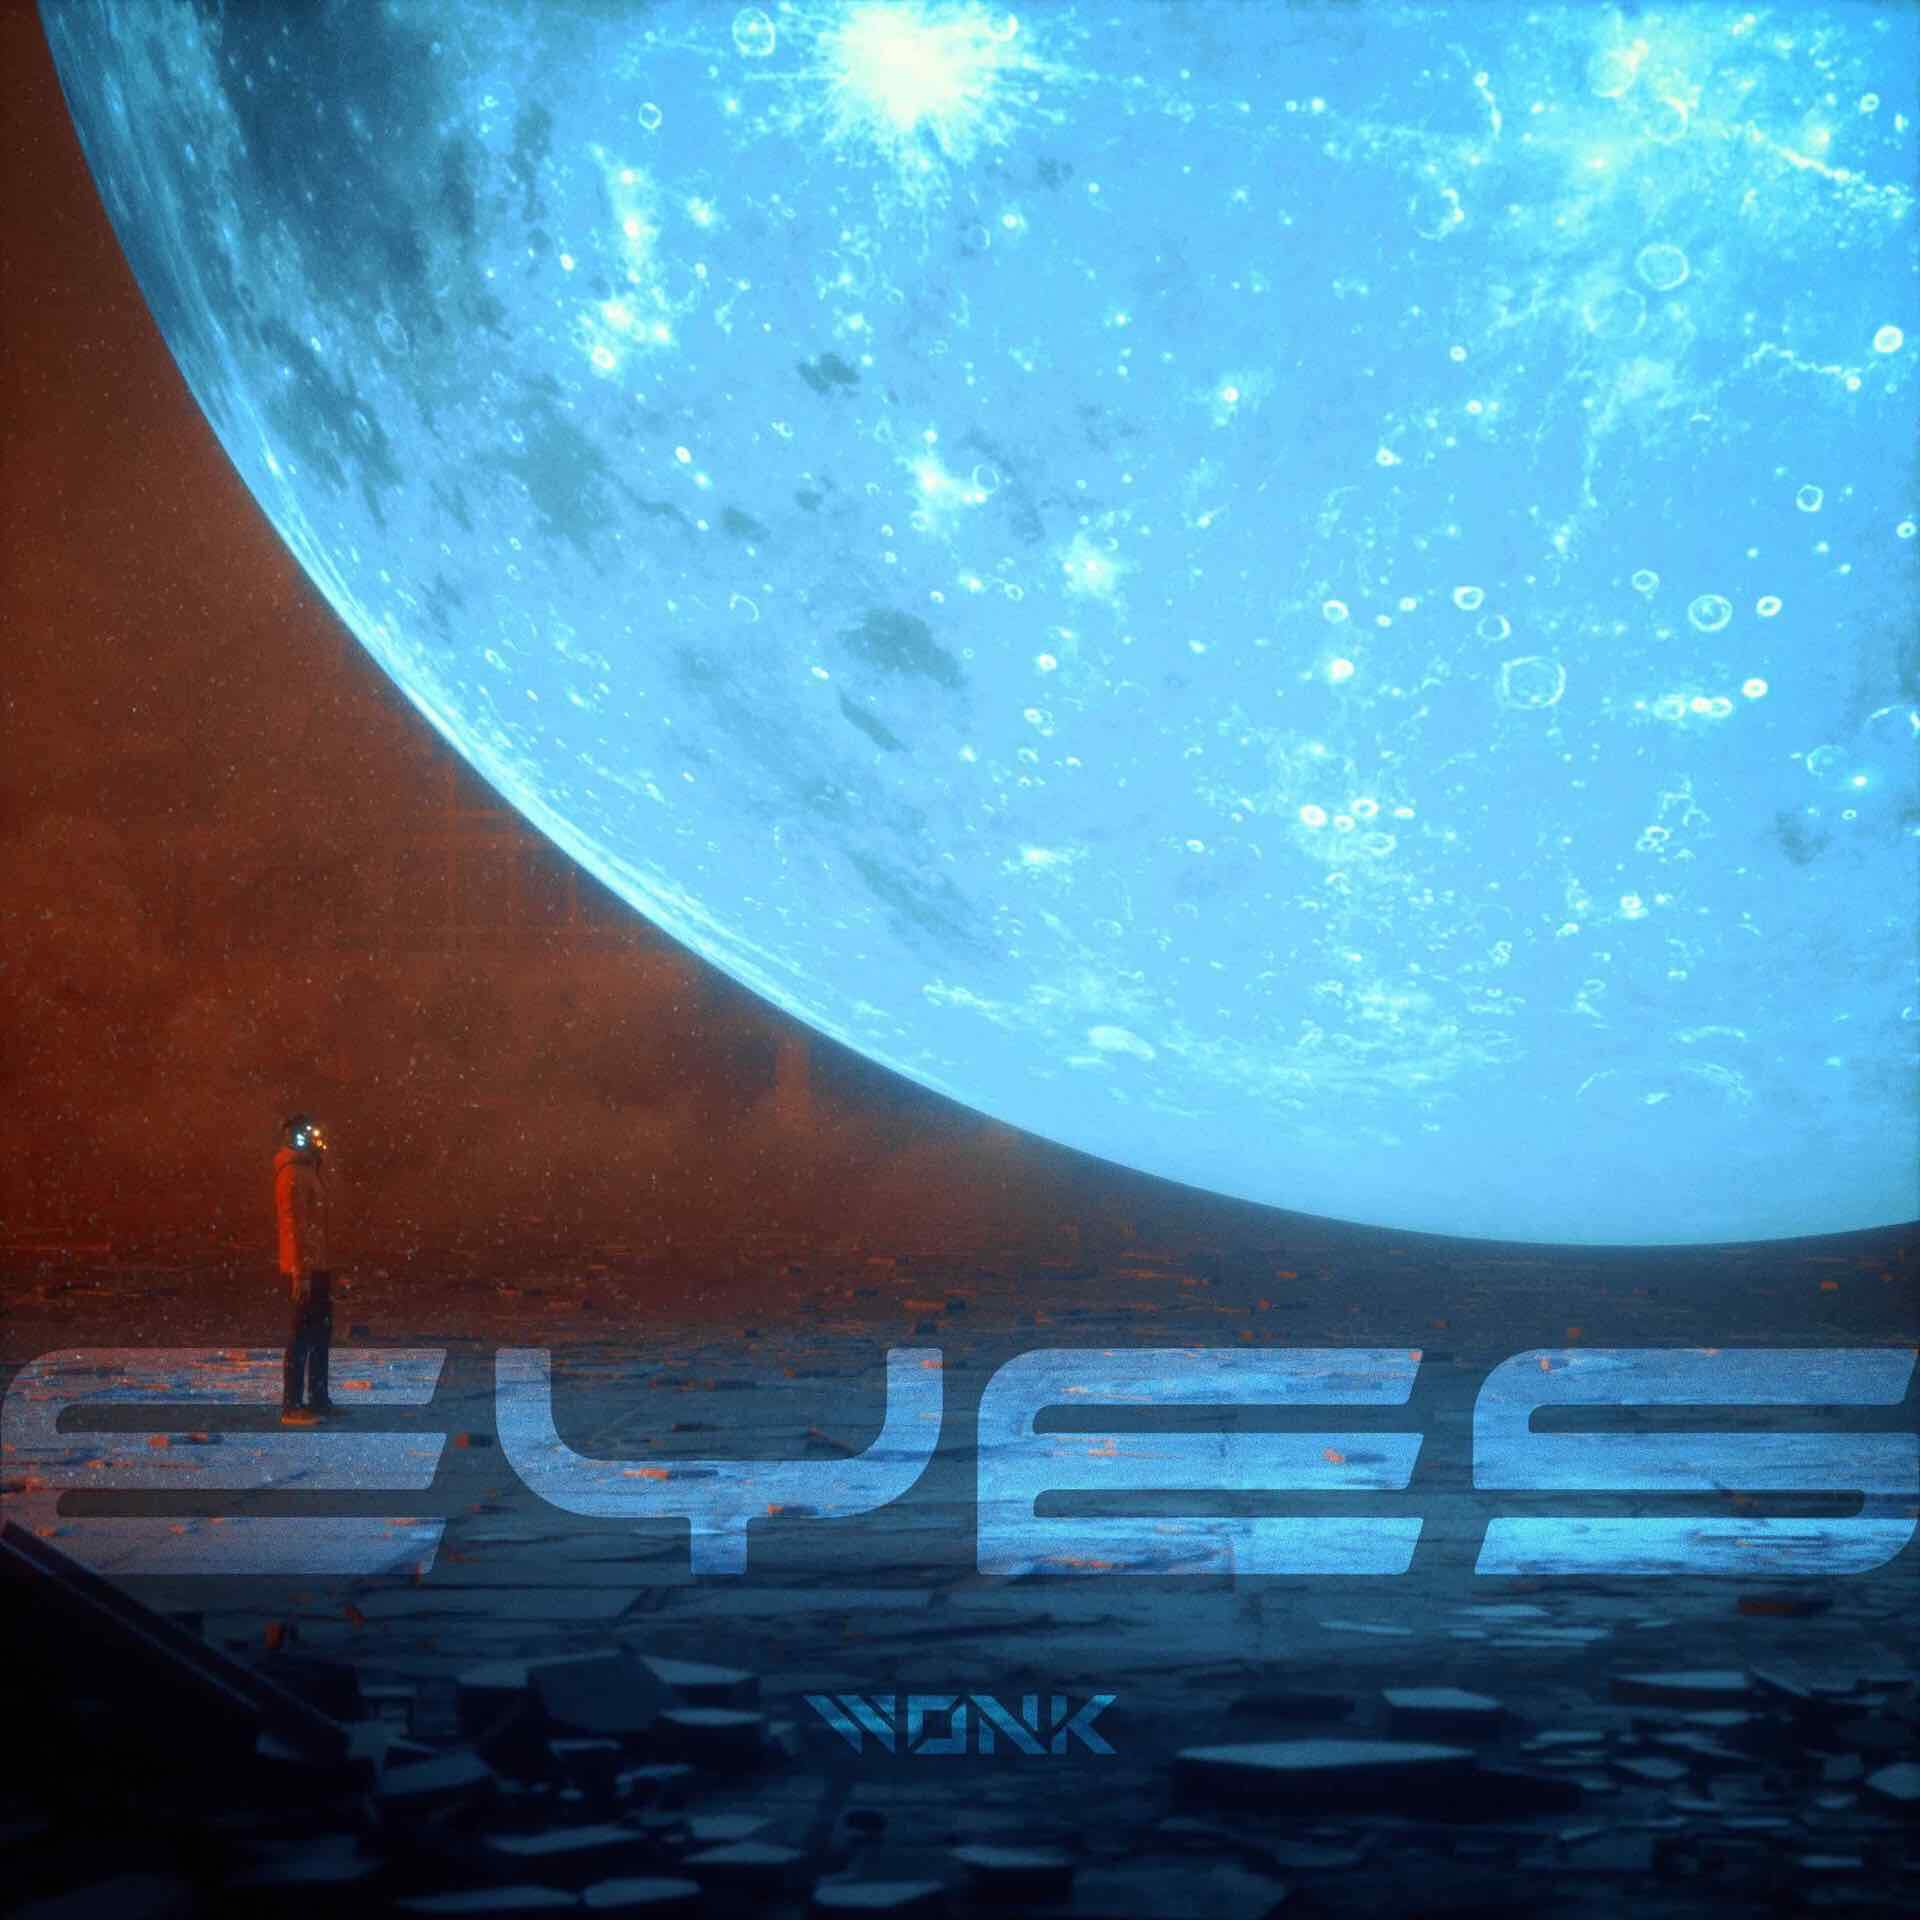 WONKのニューアルバム『EYES』に合わせたニュービジュアルが公開!リリースツアー延期も発表 music200603_wonk_1